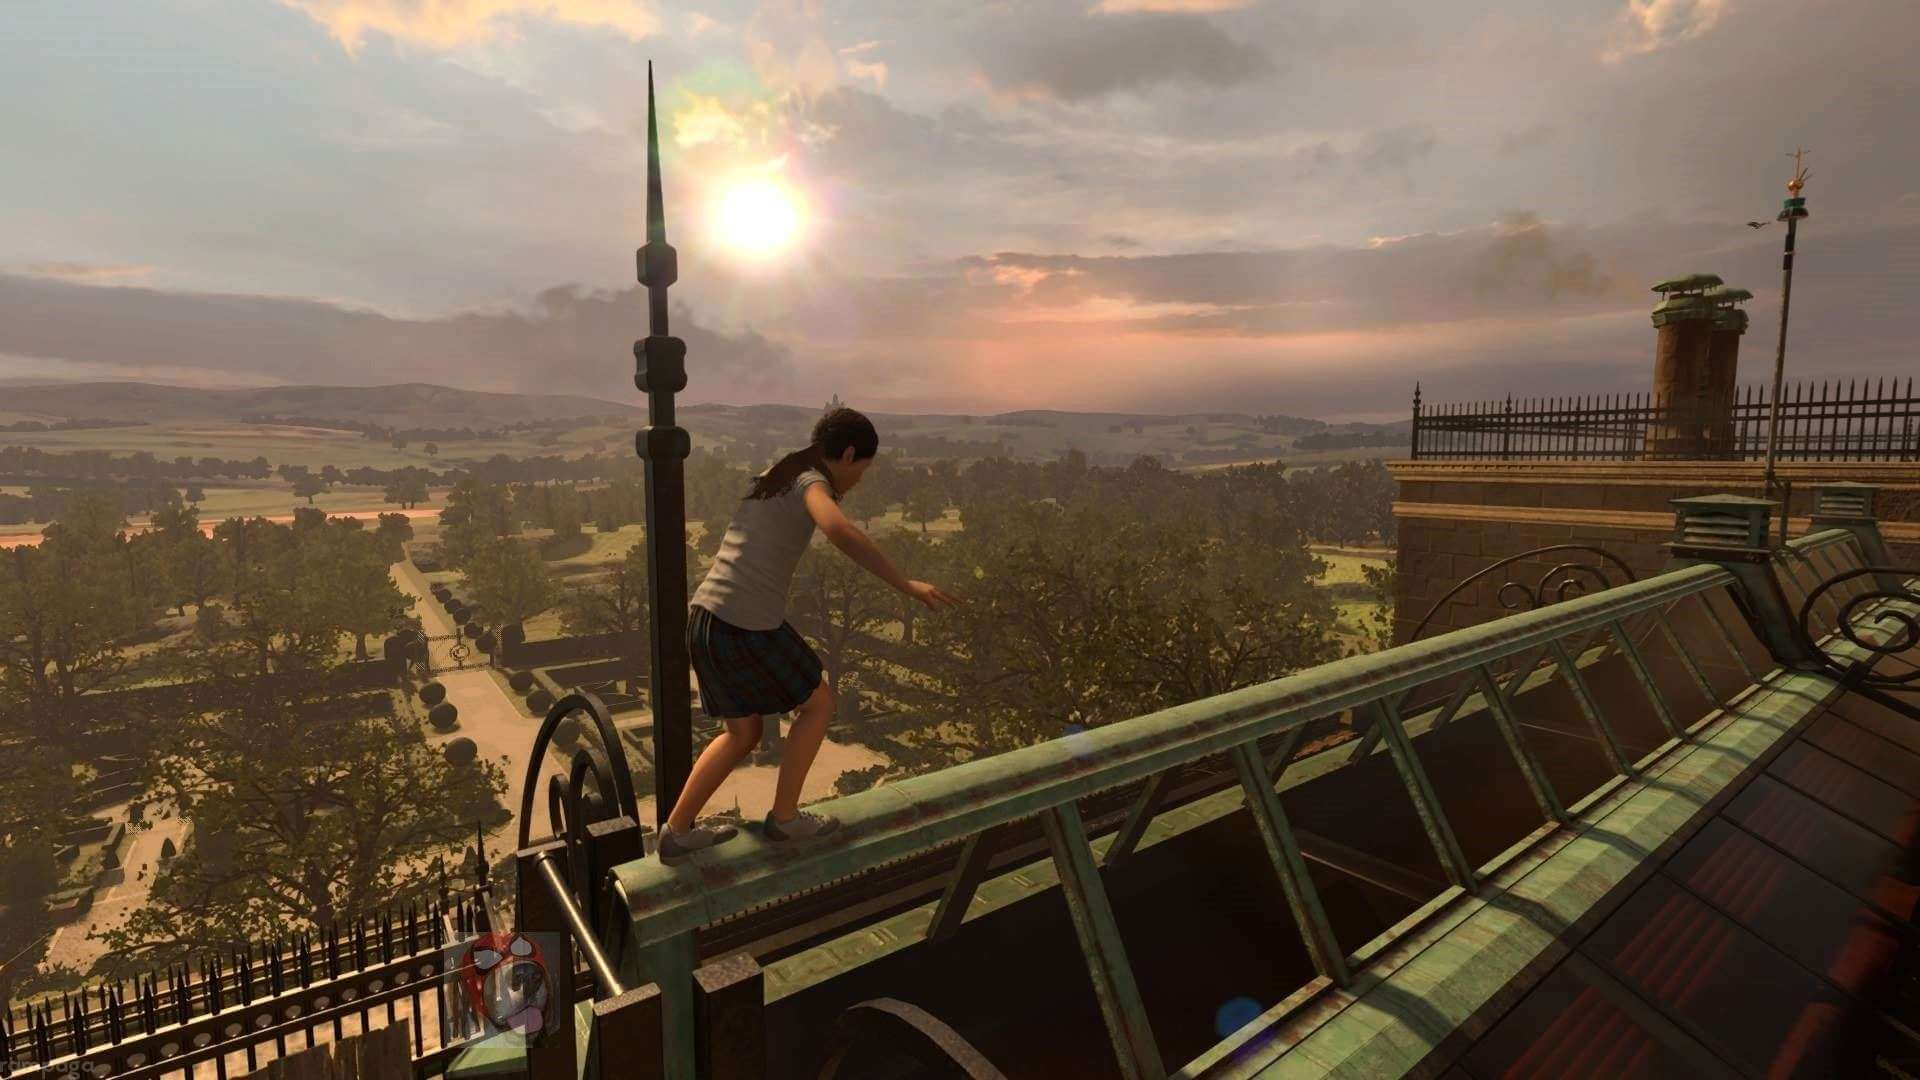 Leaked Shadow Of The Tomb Raider Screenshots Show Young Lara Croft